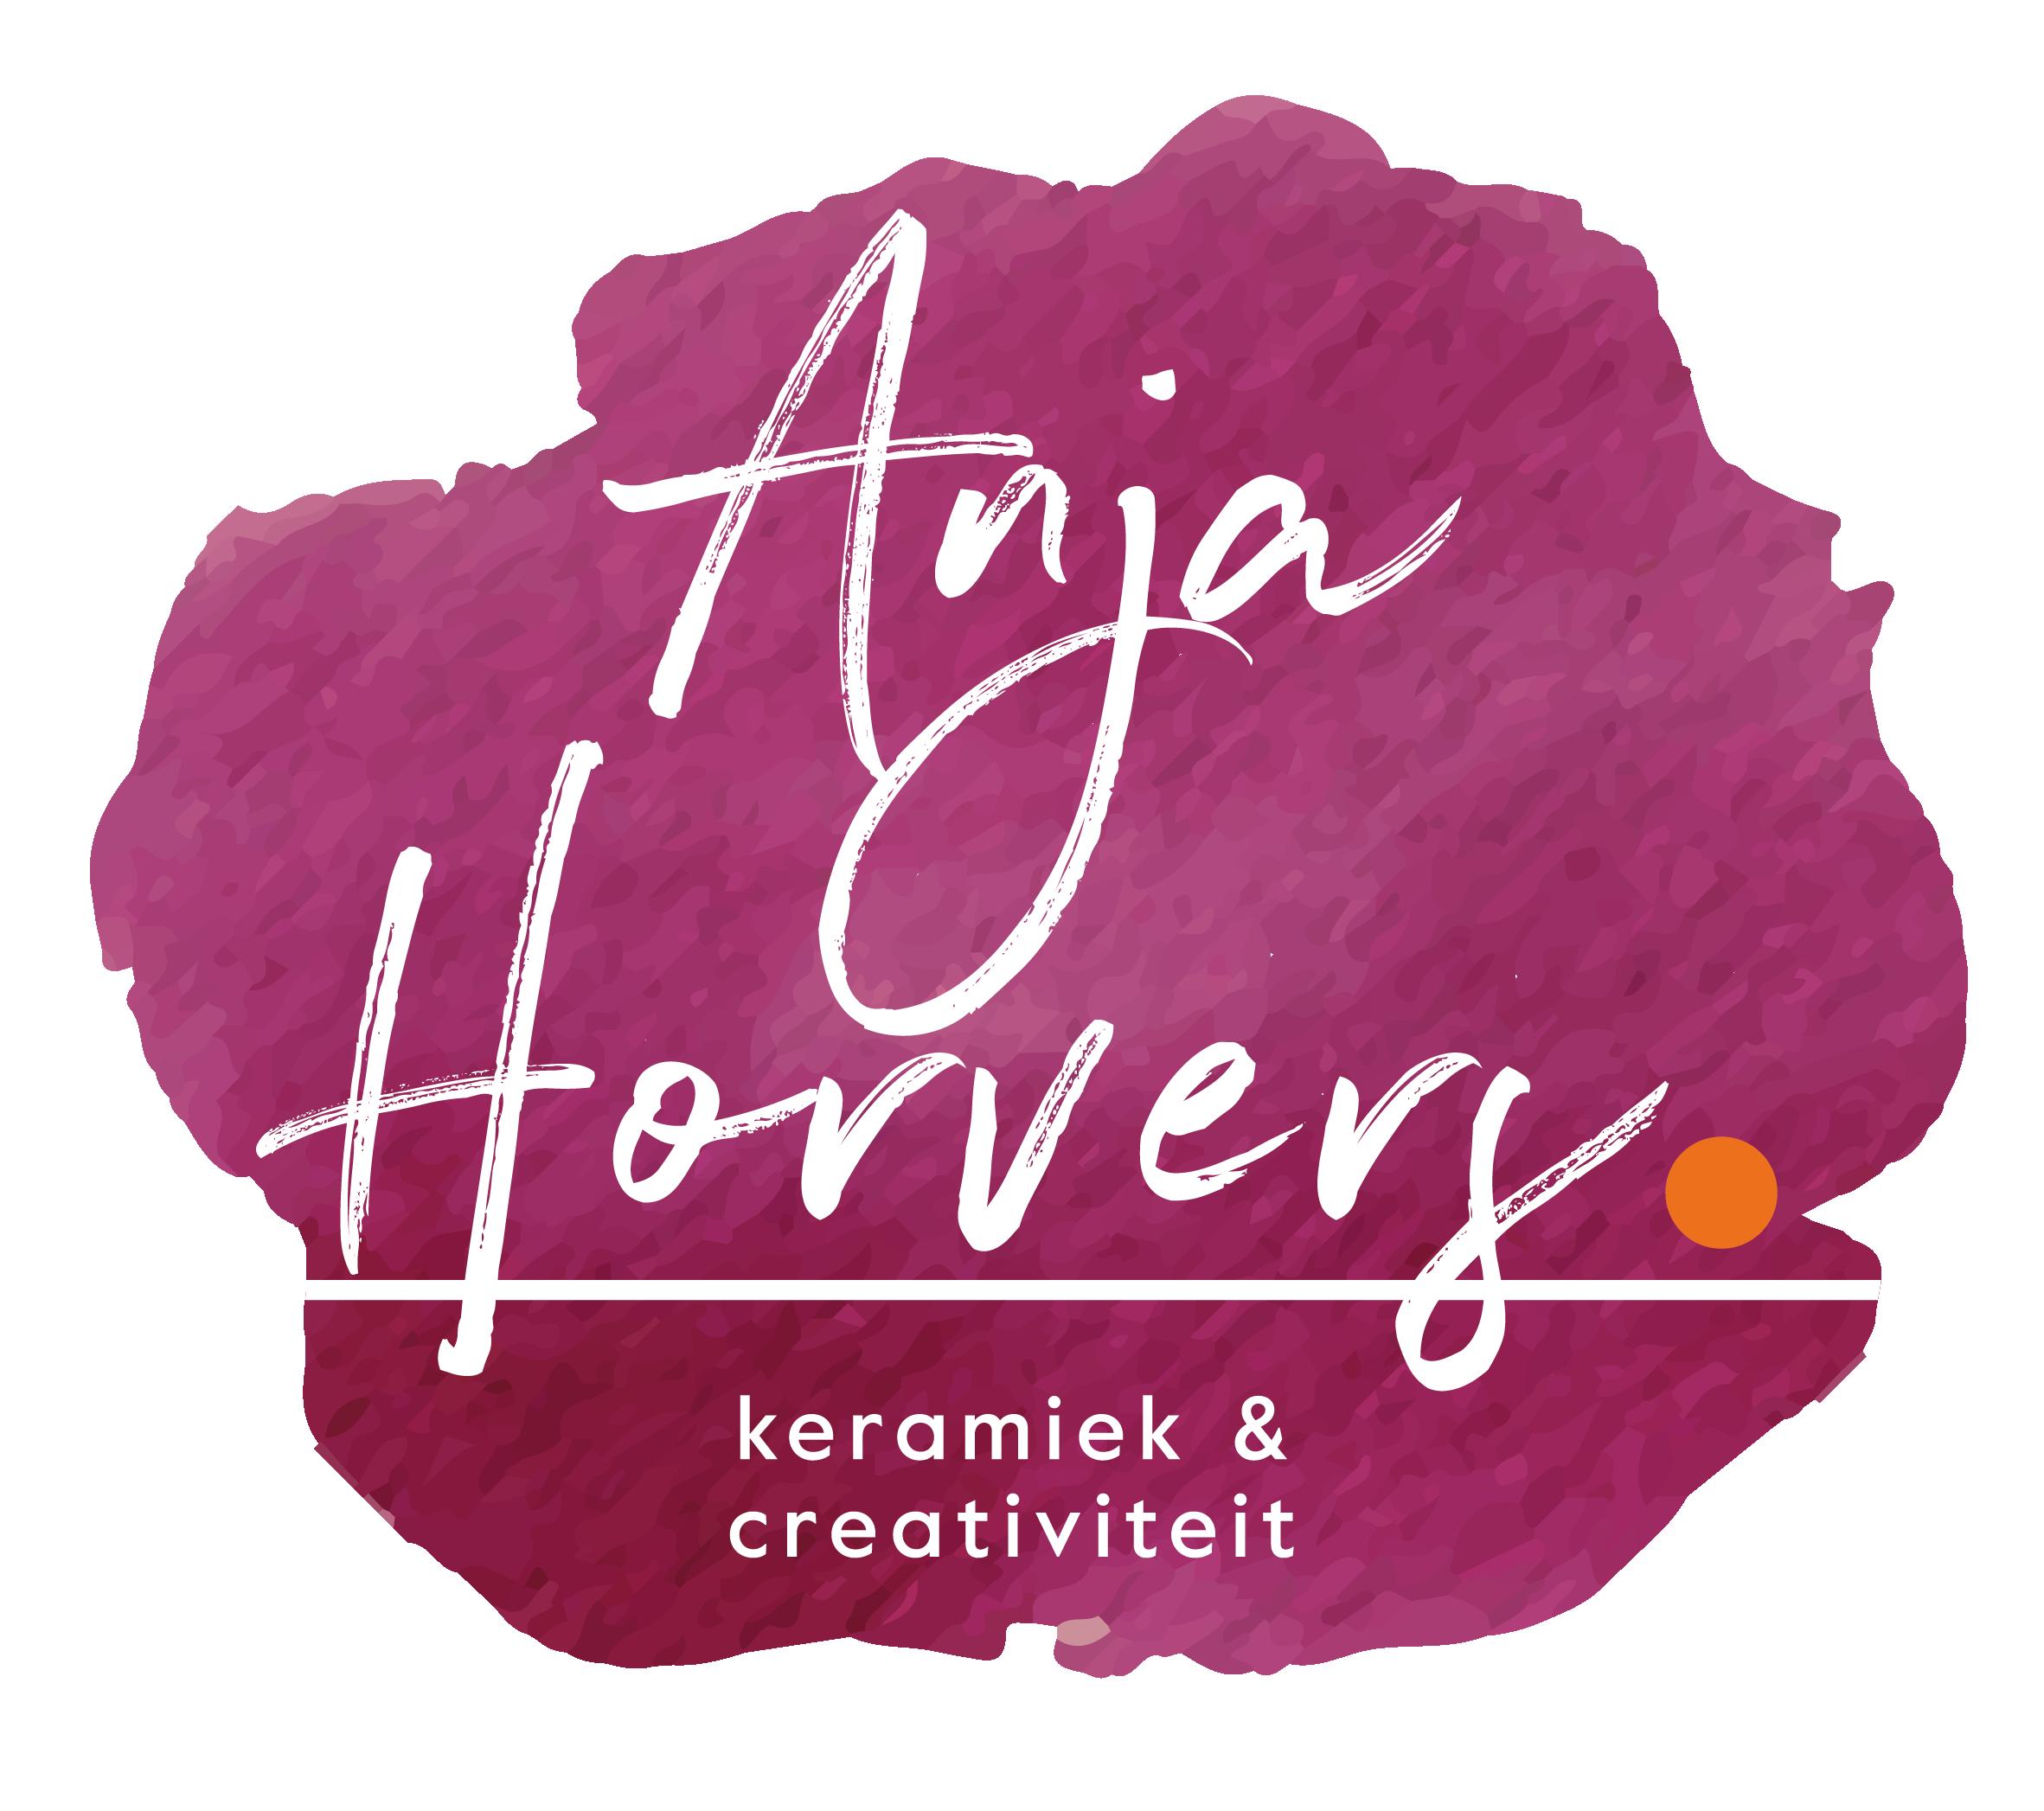 logo_anjahorvers_bordeaux_2